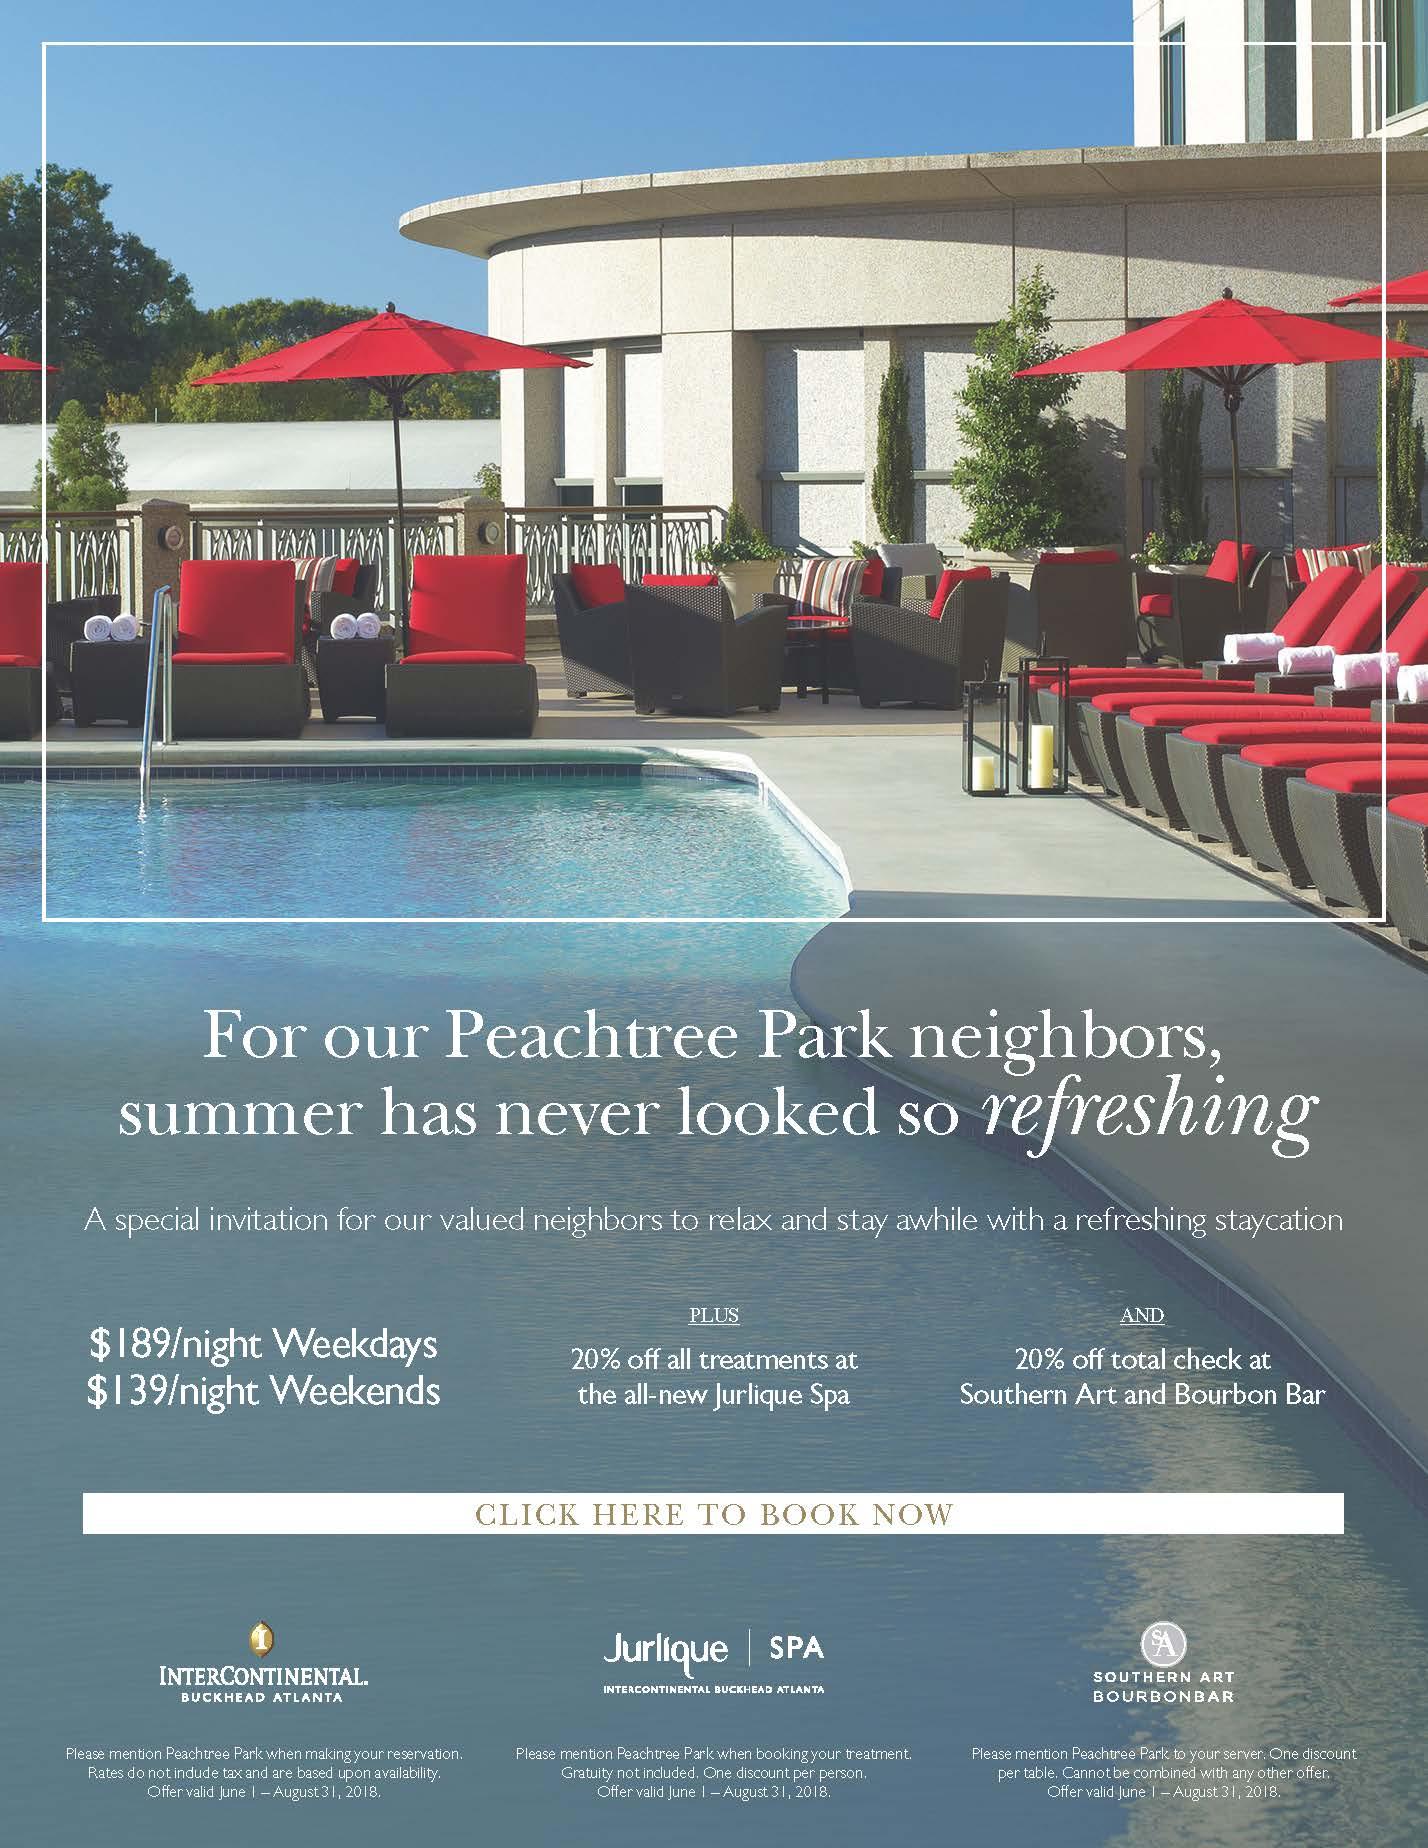 InterContinental Buckhead Atlanta_Peachtree Park Summer 2018 Promotion.jpg